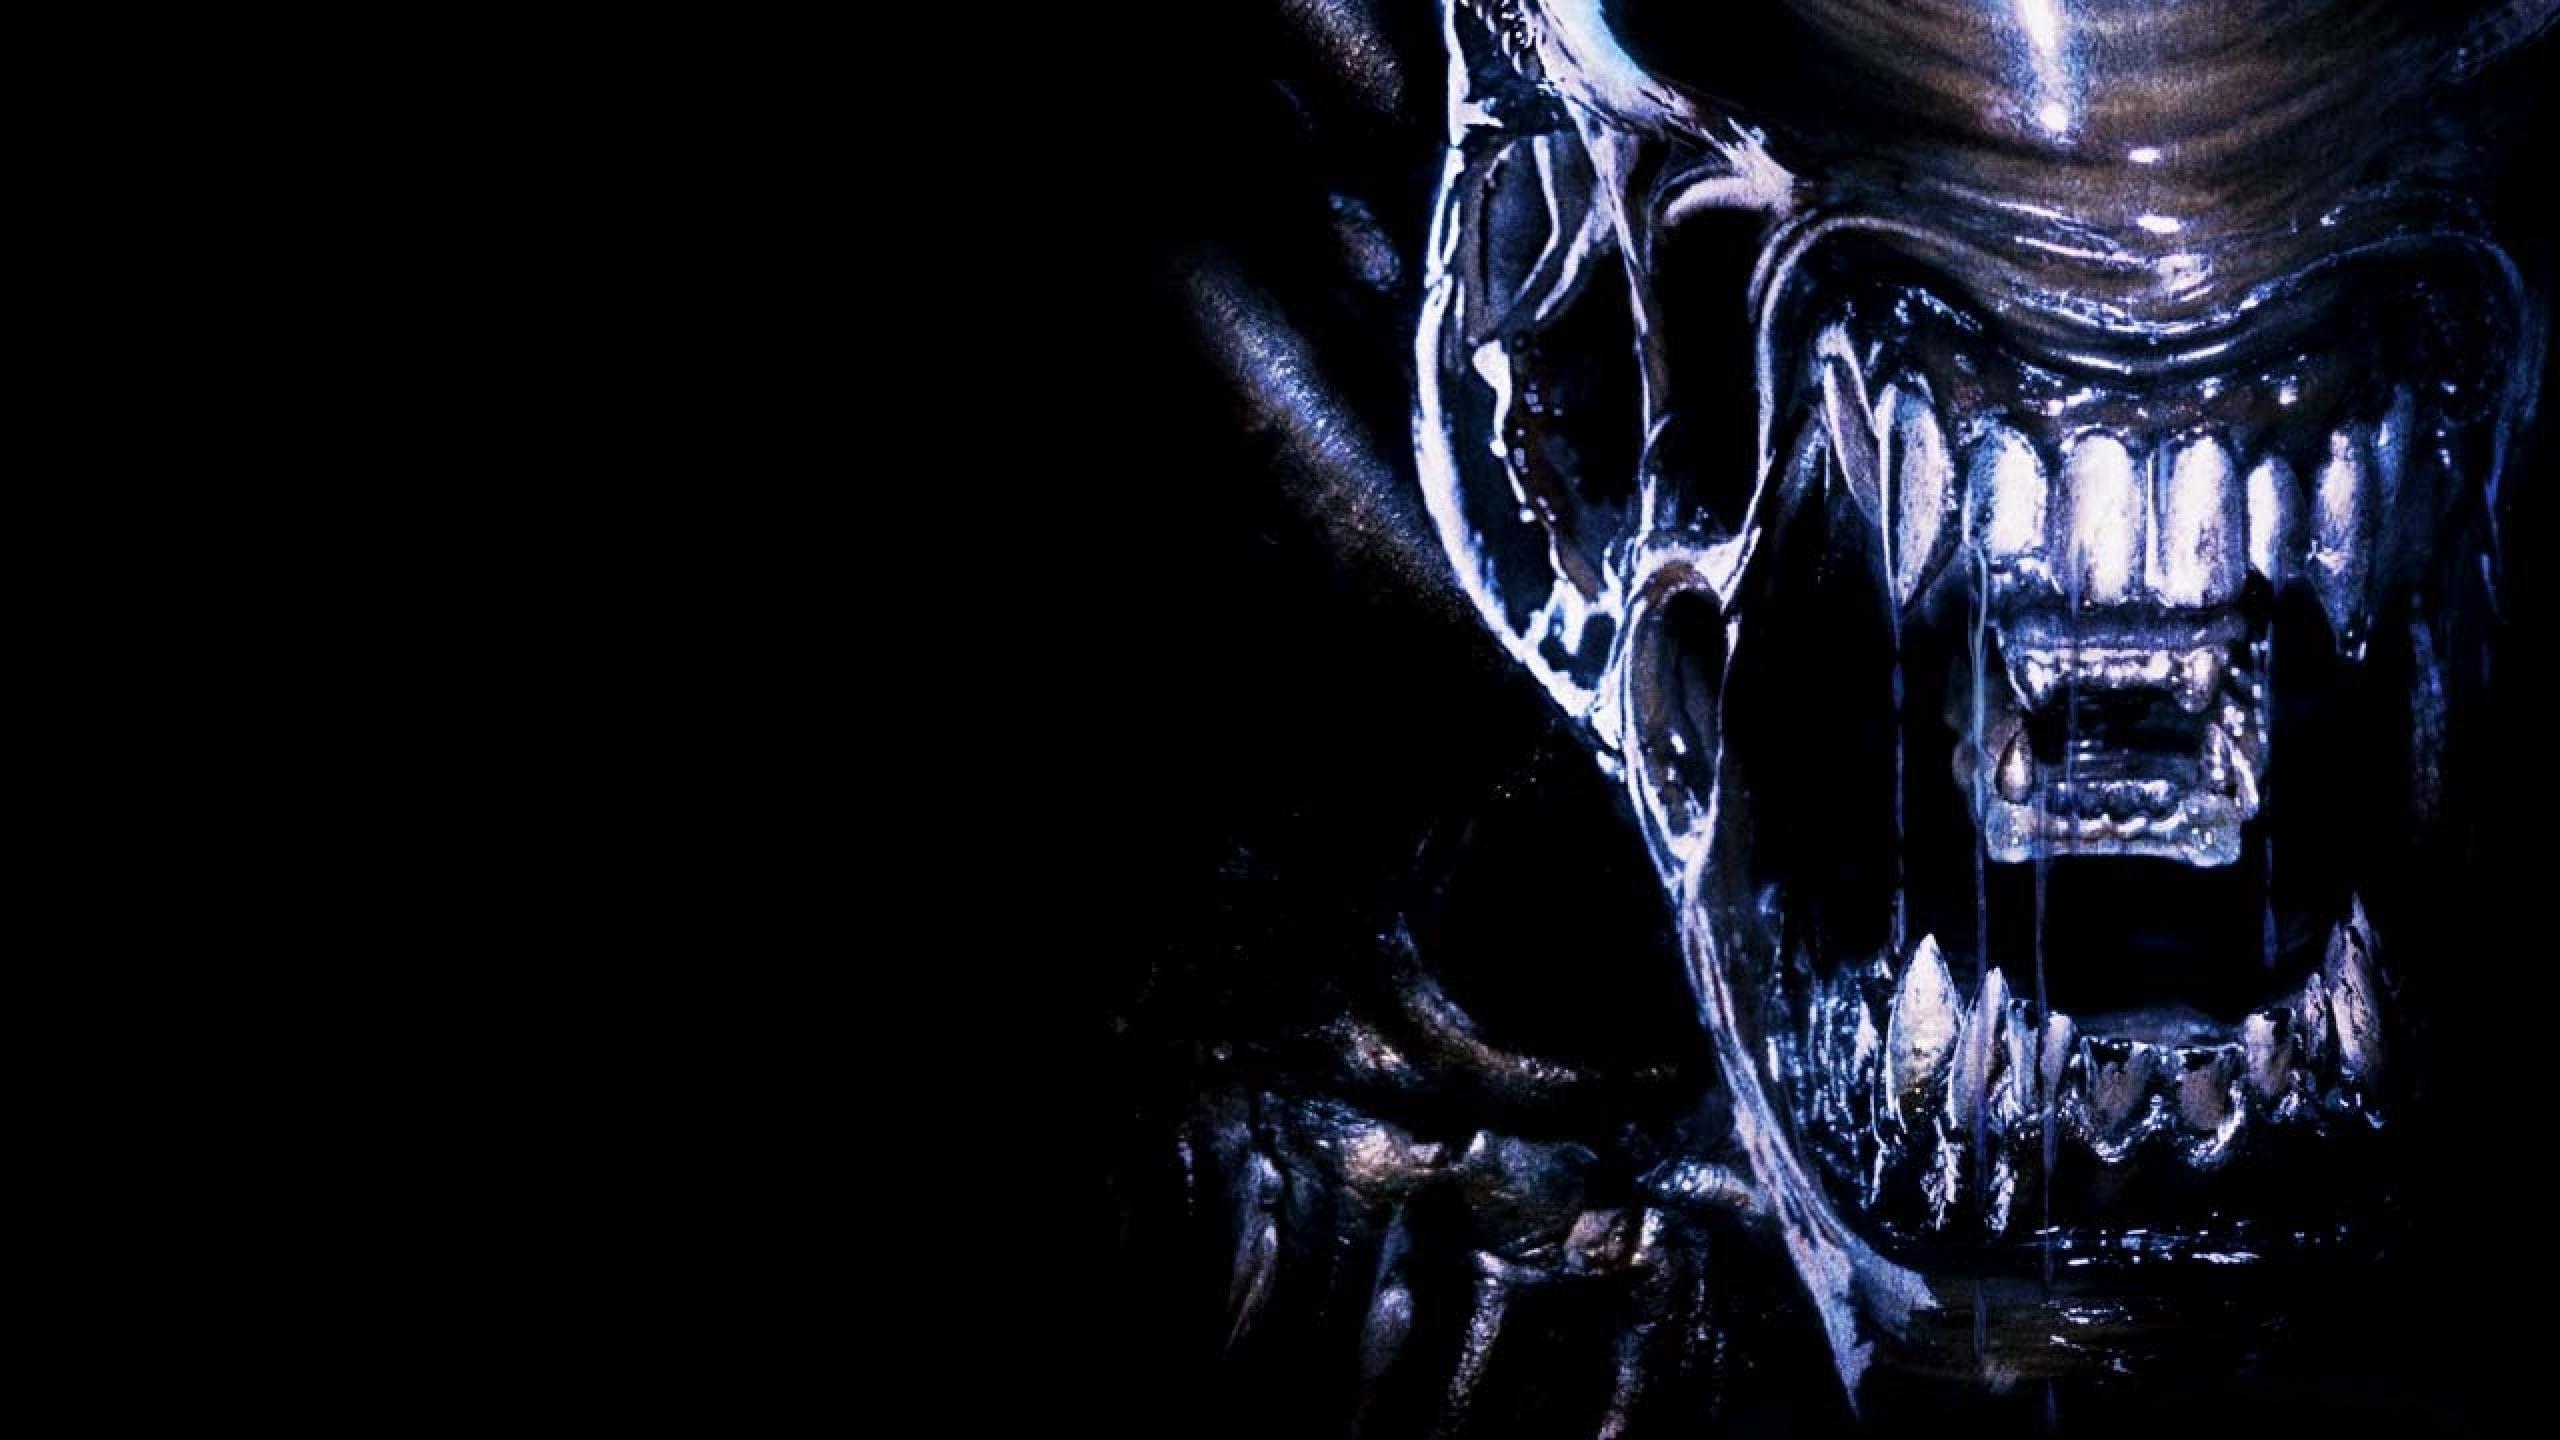 Sci Fi Wallpaper 2560x1440: ALIEN Horror Sci-fi Futuristic Dark Aliens Creature